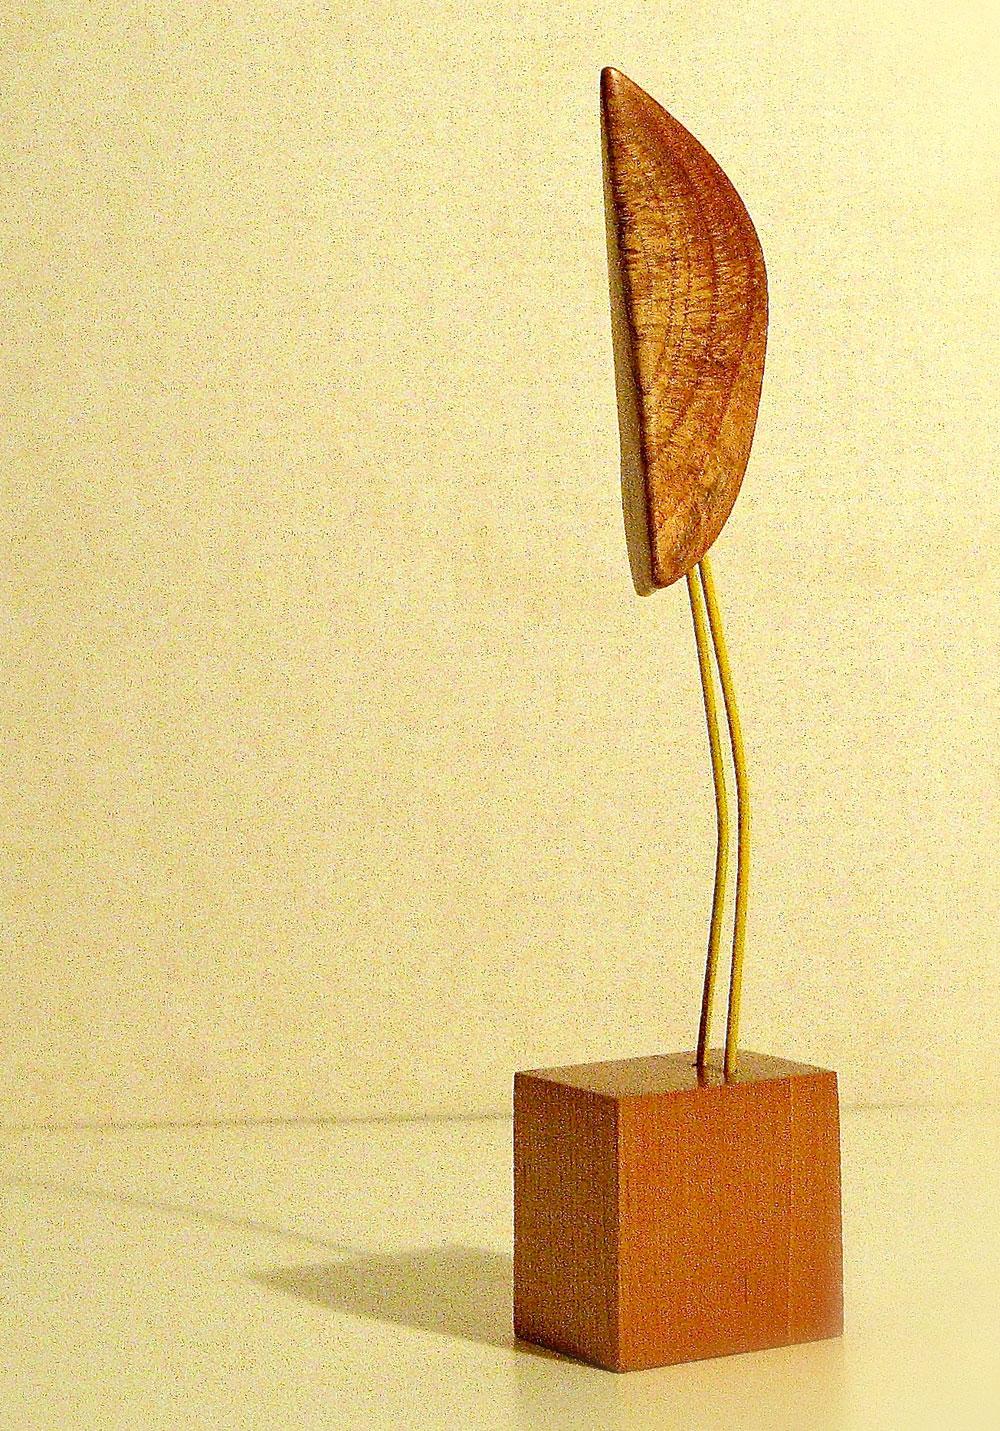 Knot Bird woodcarving sculpture